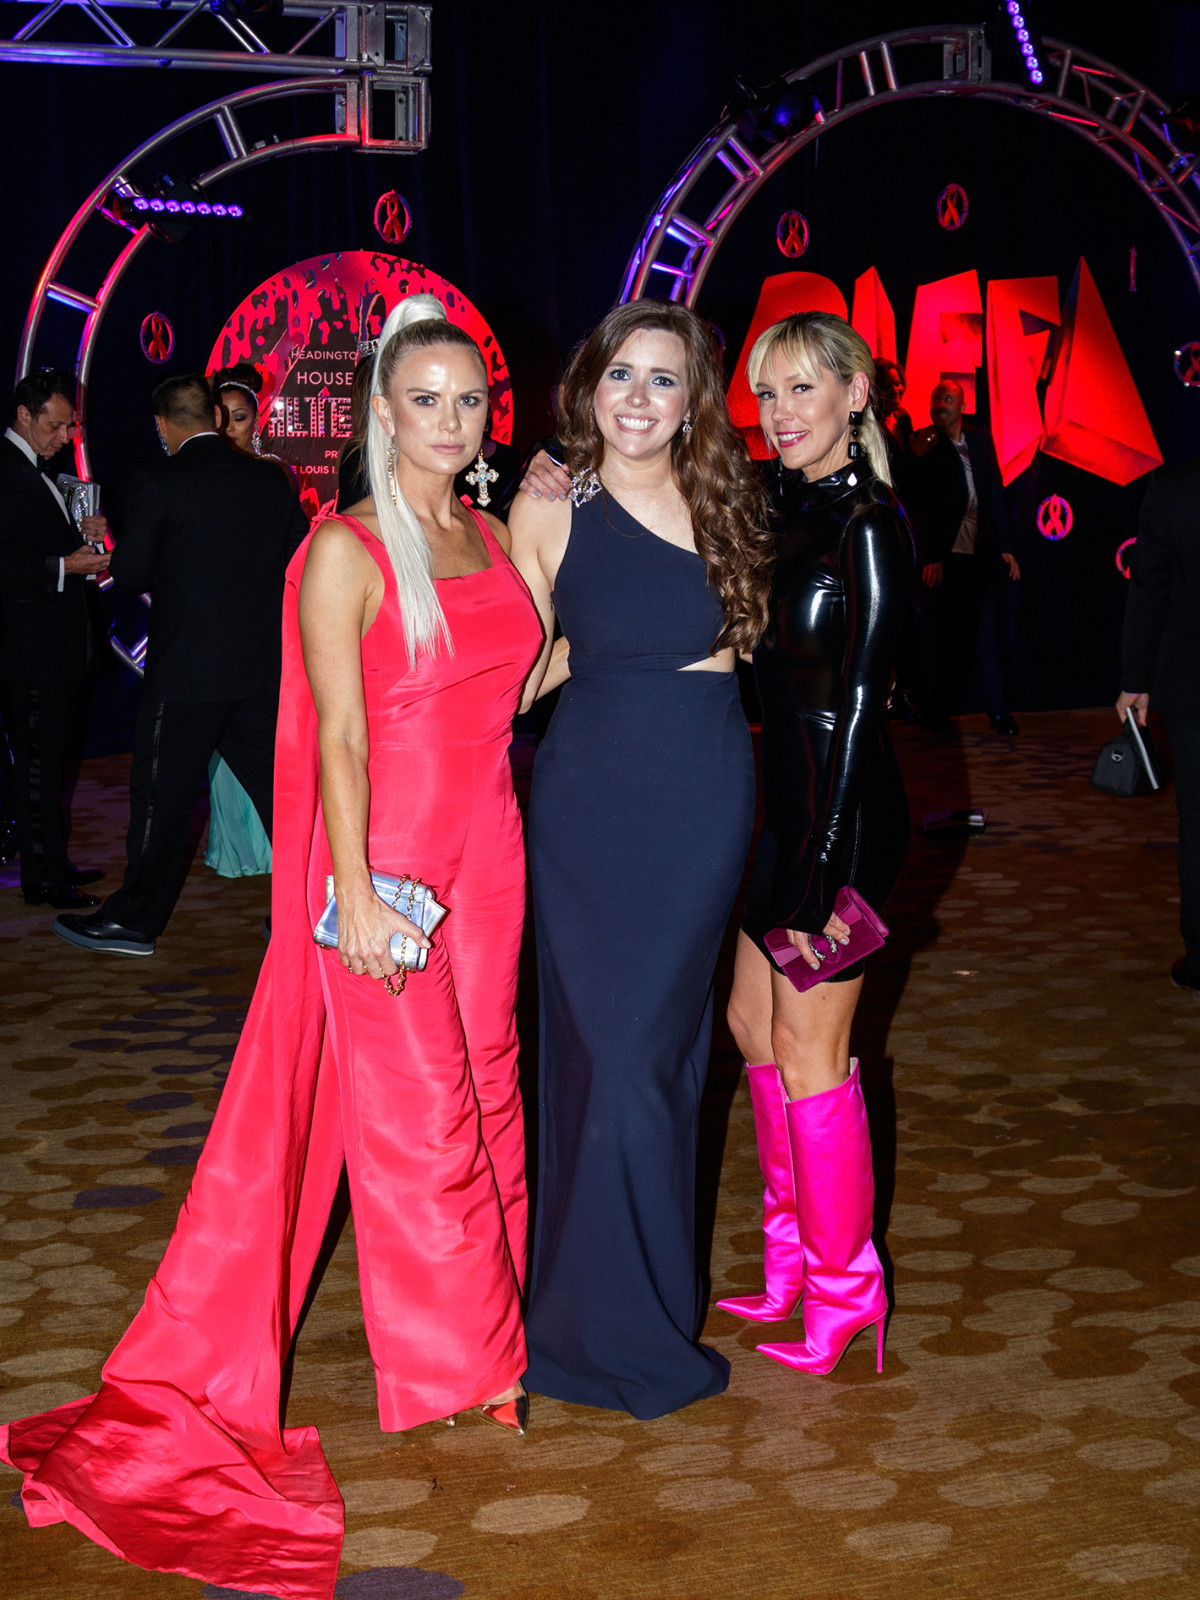 Kristin Smith, Alison Zelaya, Kimberly Aston at House of DIFFA 2018